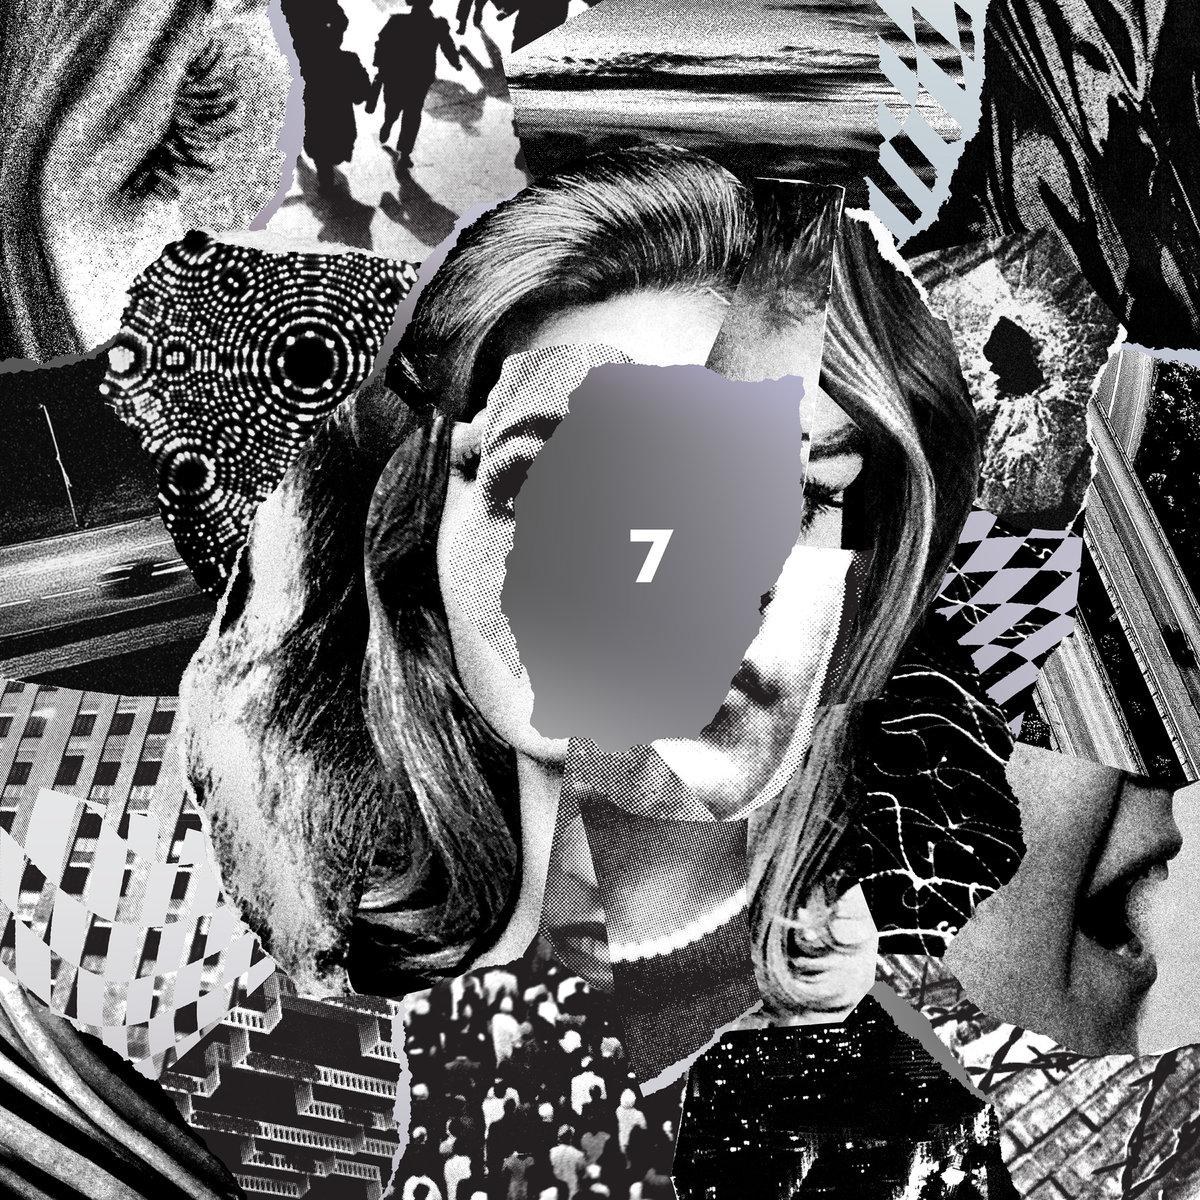 beach house 7 обзор альбома album review рецензия